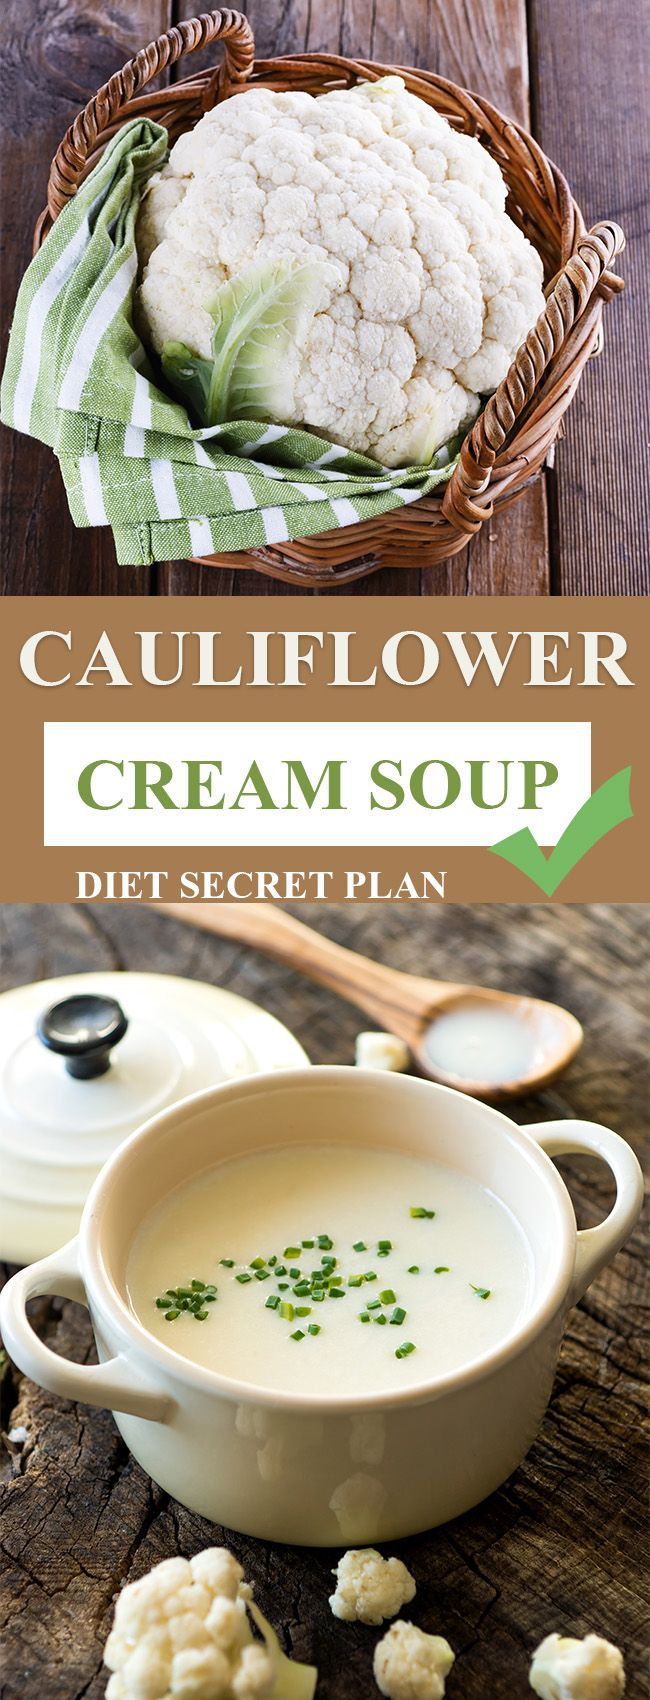 Cream of Cauliflower Soup Recipe – Diet Secret Plan – Fat Burning Project